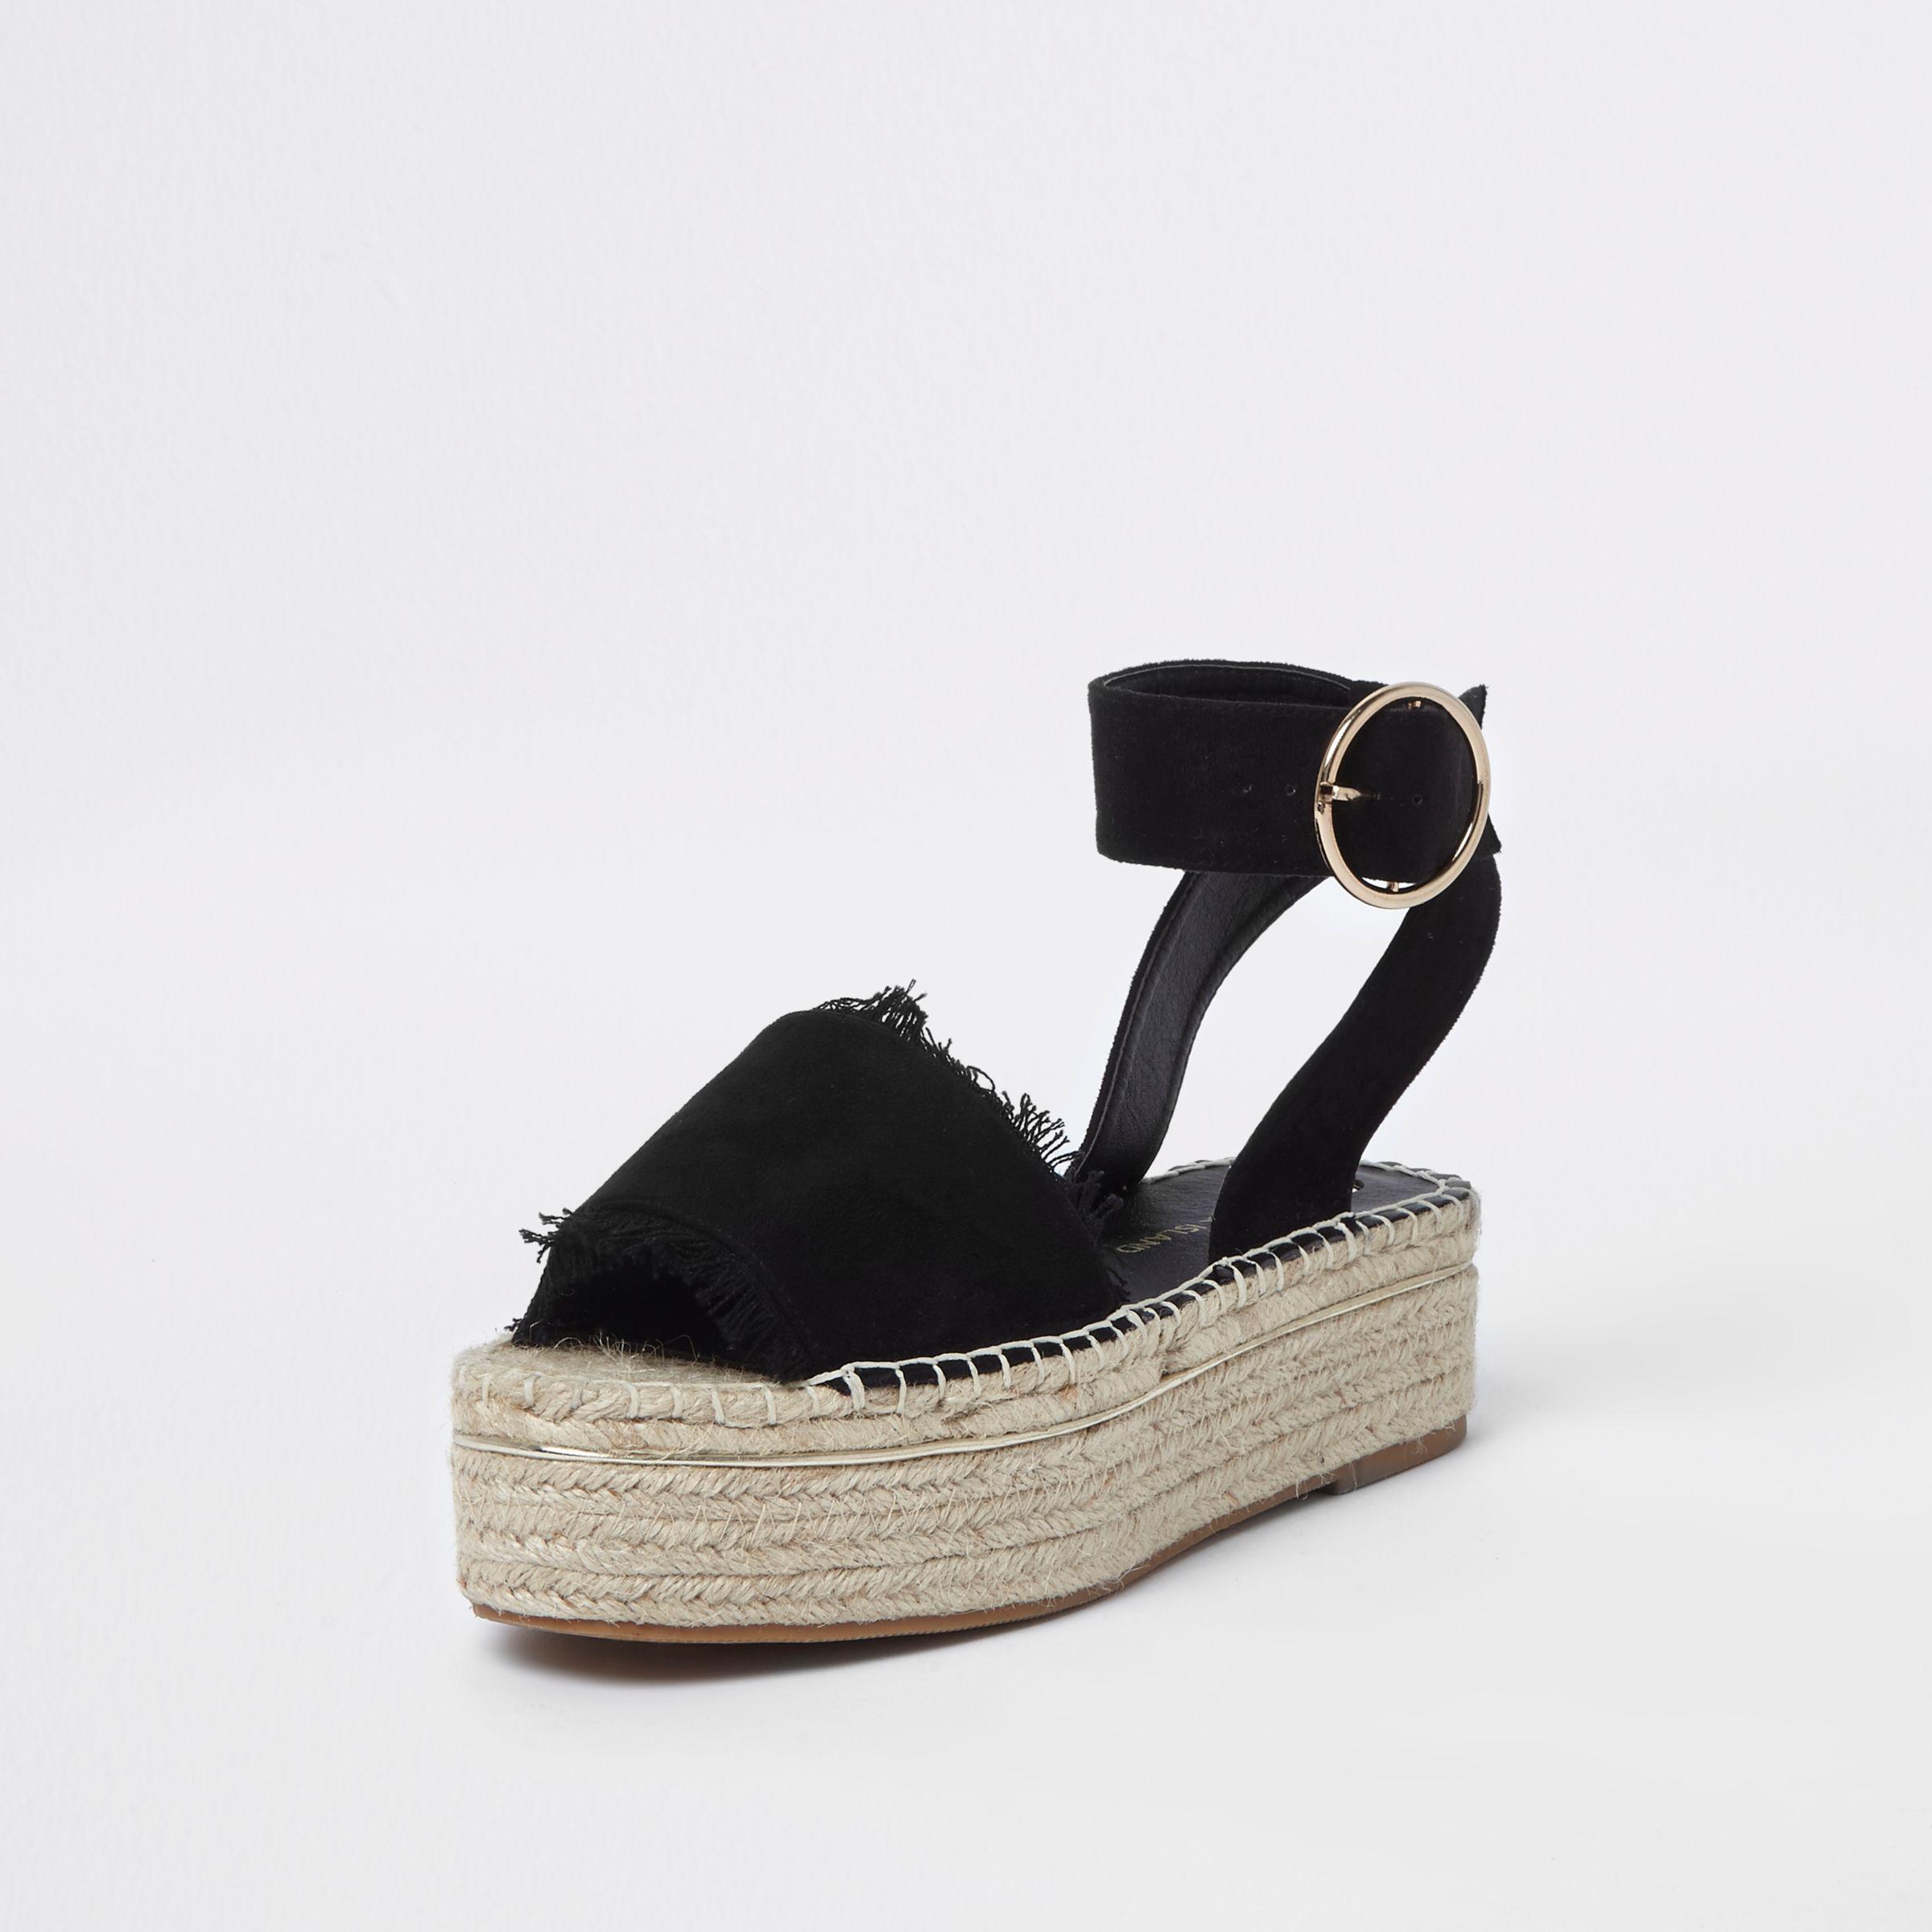 19b32cb1dd102 Lyst - River Island Black Espadrille Platform Sandals in Black